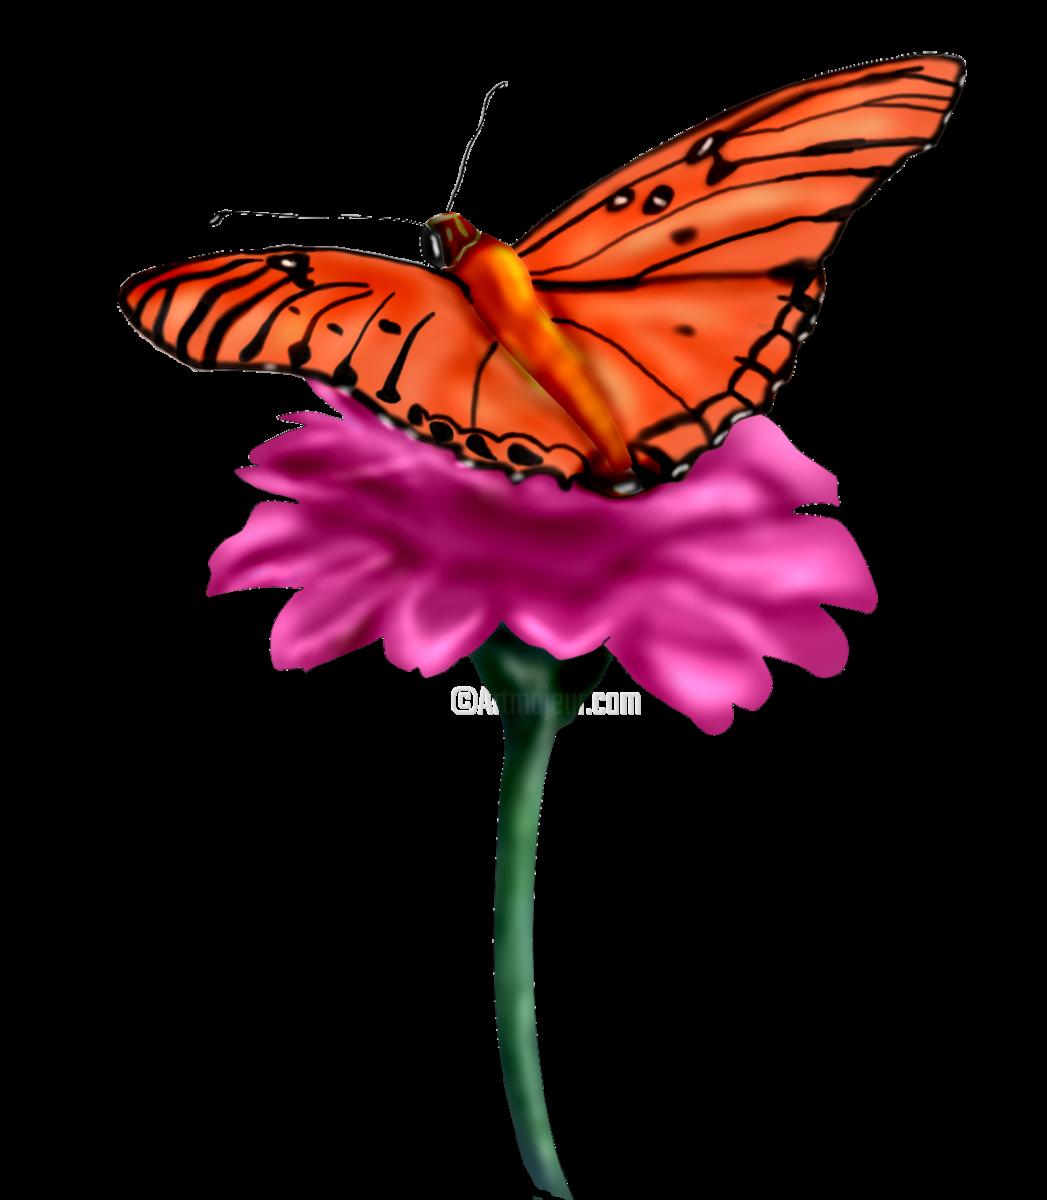 borboleta.png Painting by Tiago Valim.